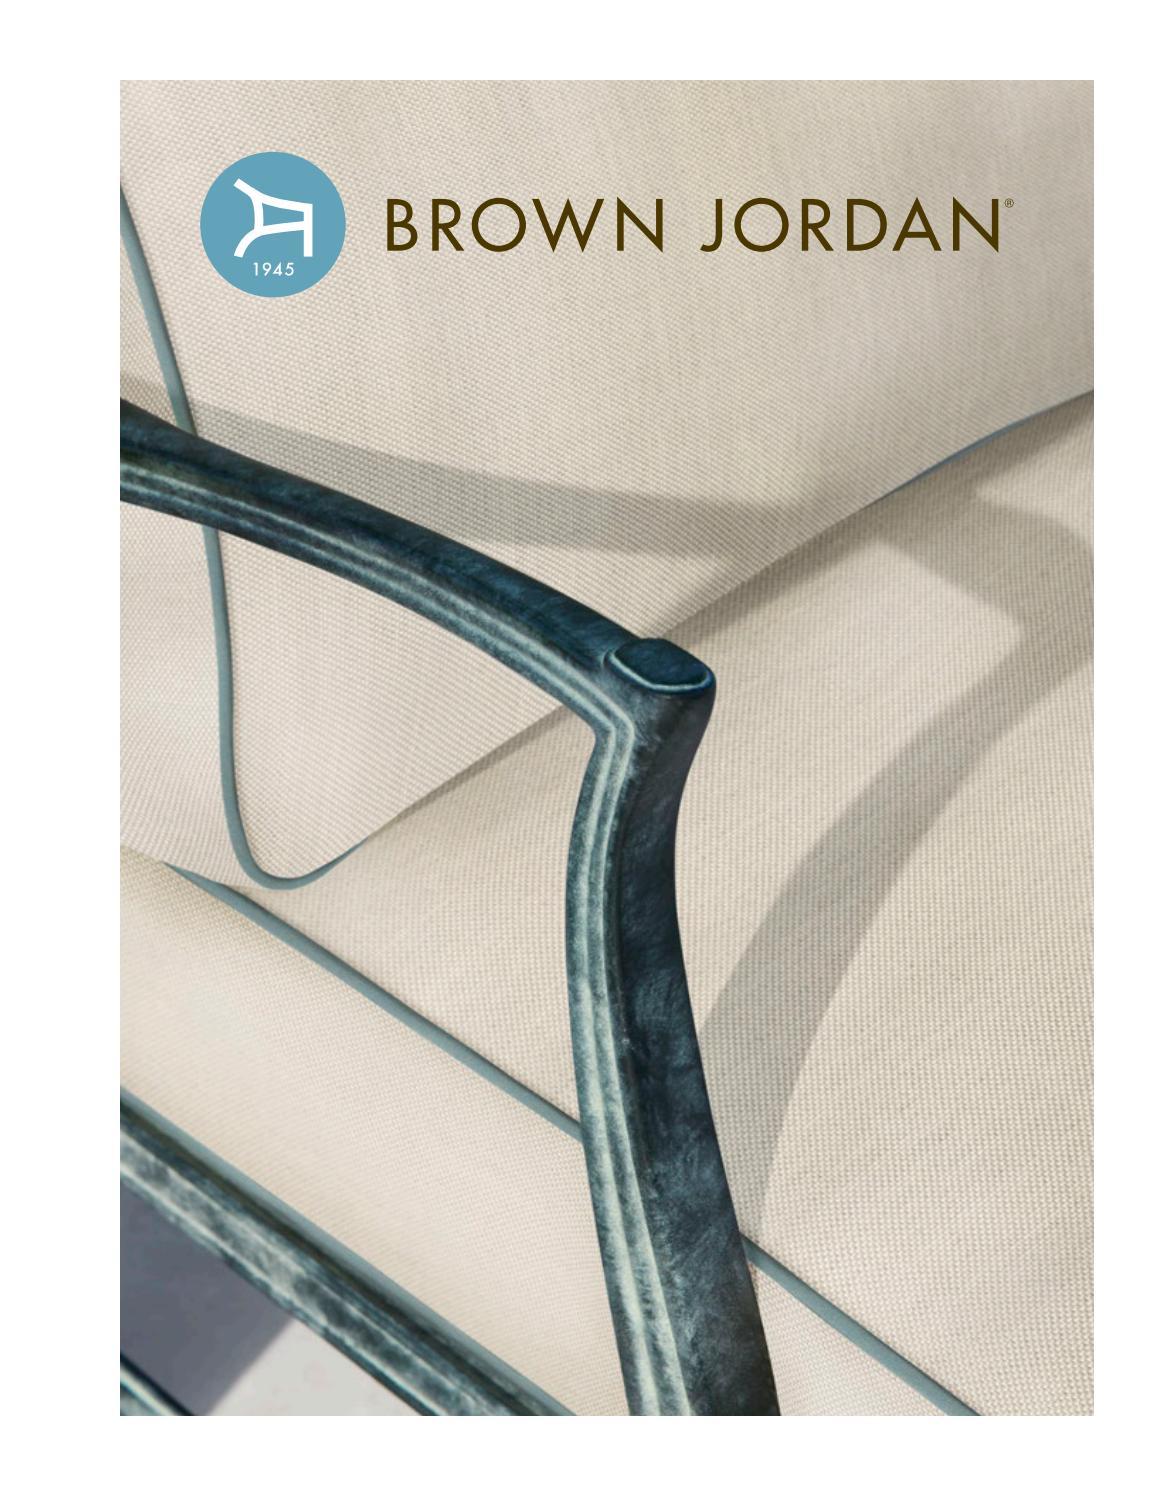 brown jordan catalog 2017 by brown